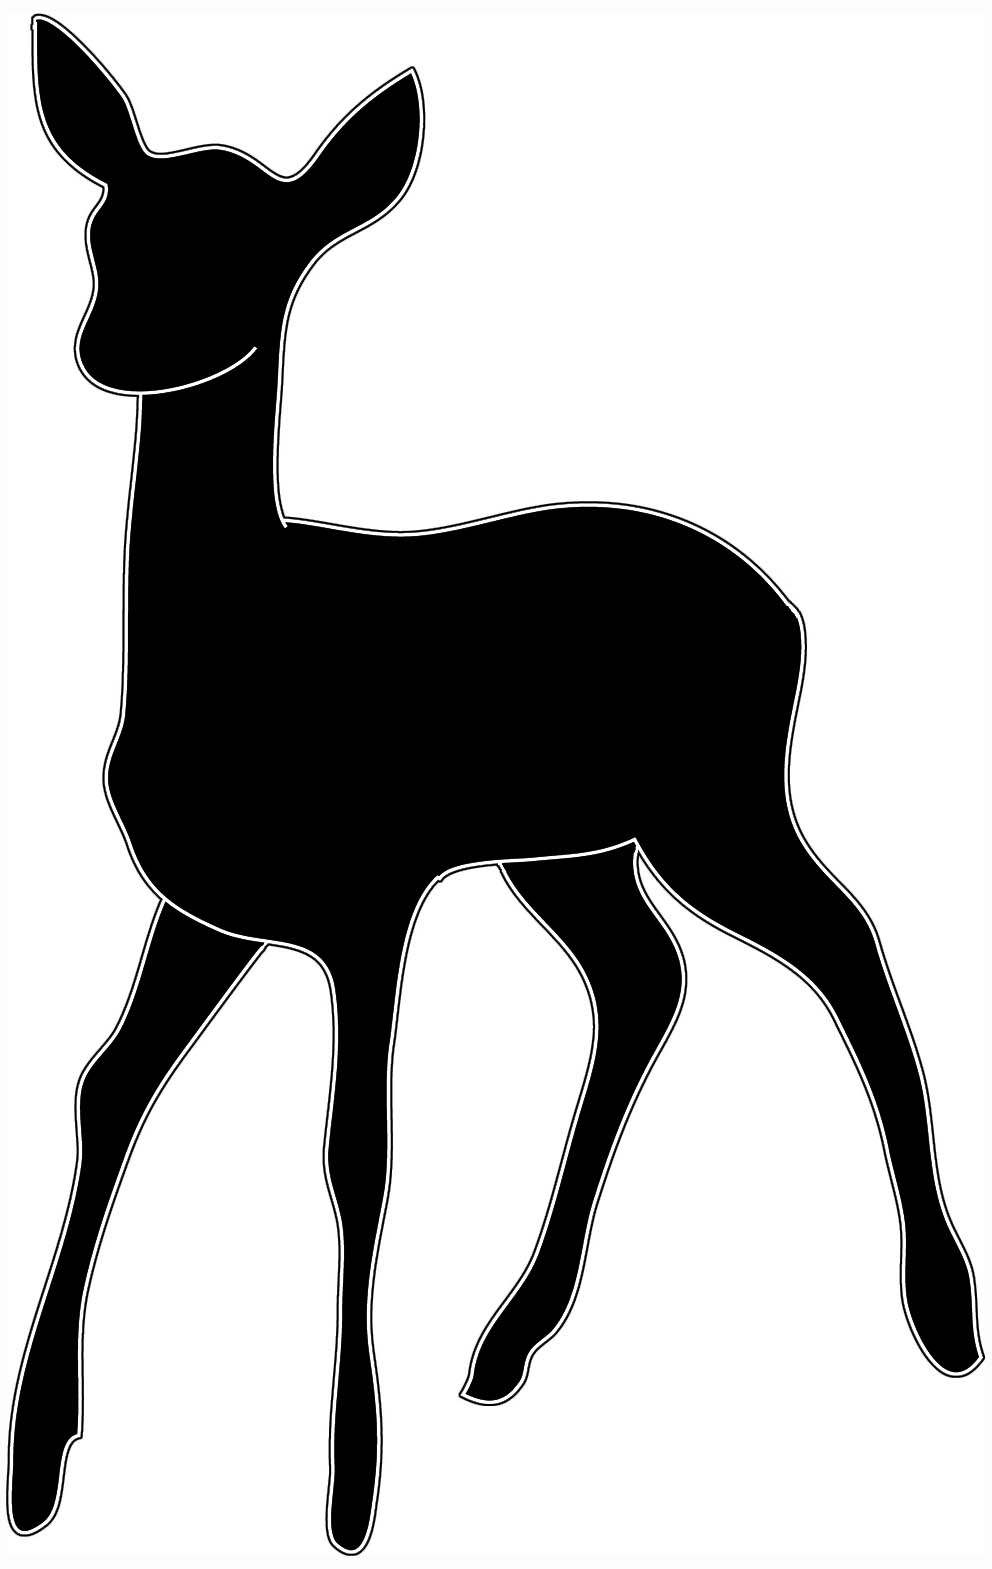 Baby deer silhouette clip art.